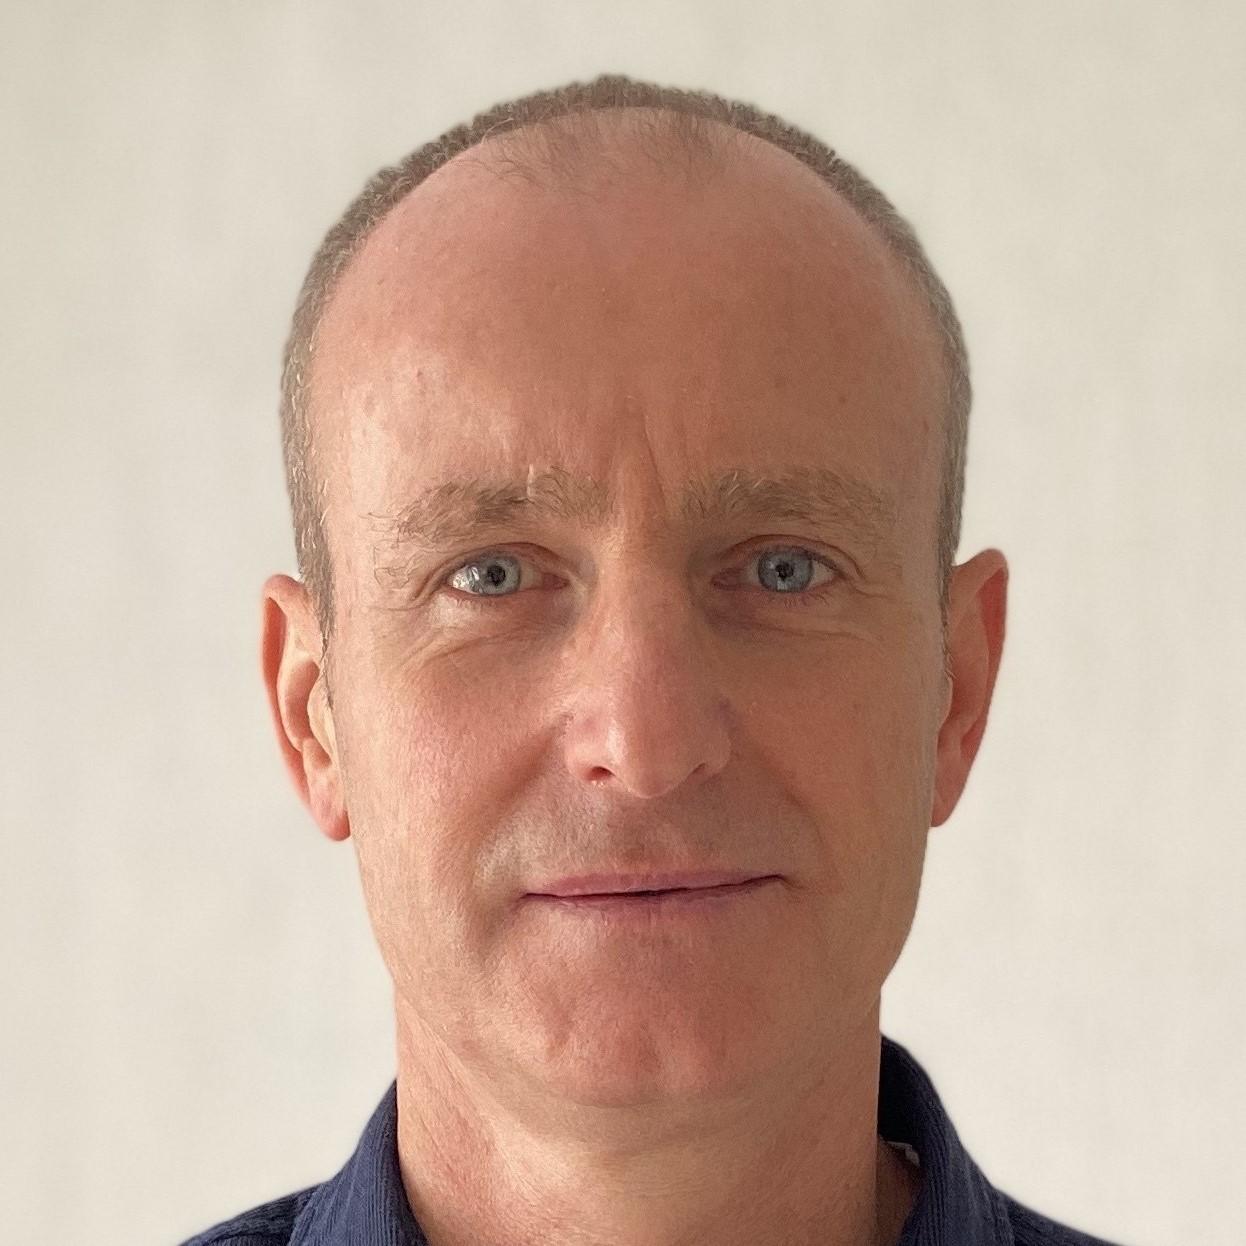 Miroslav Šimko